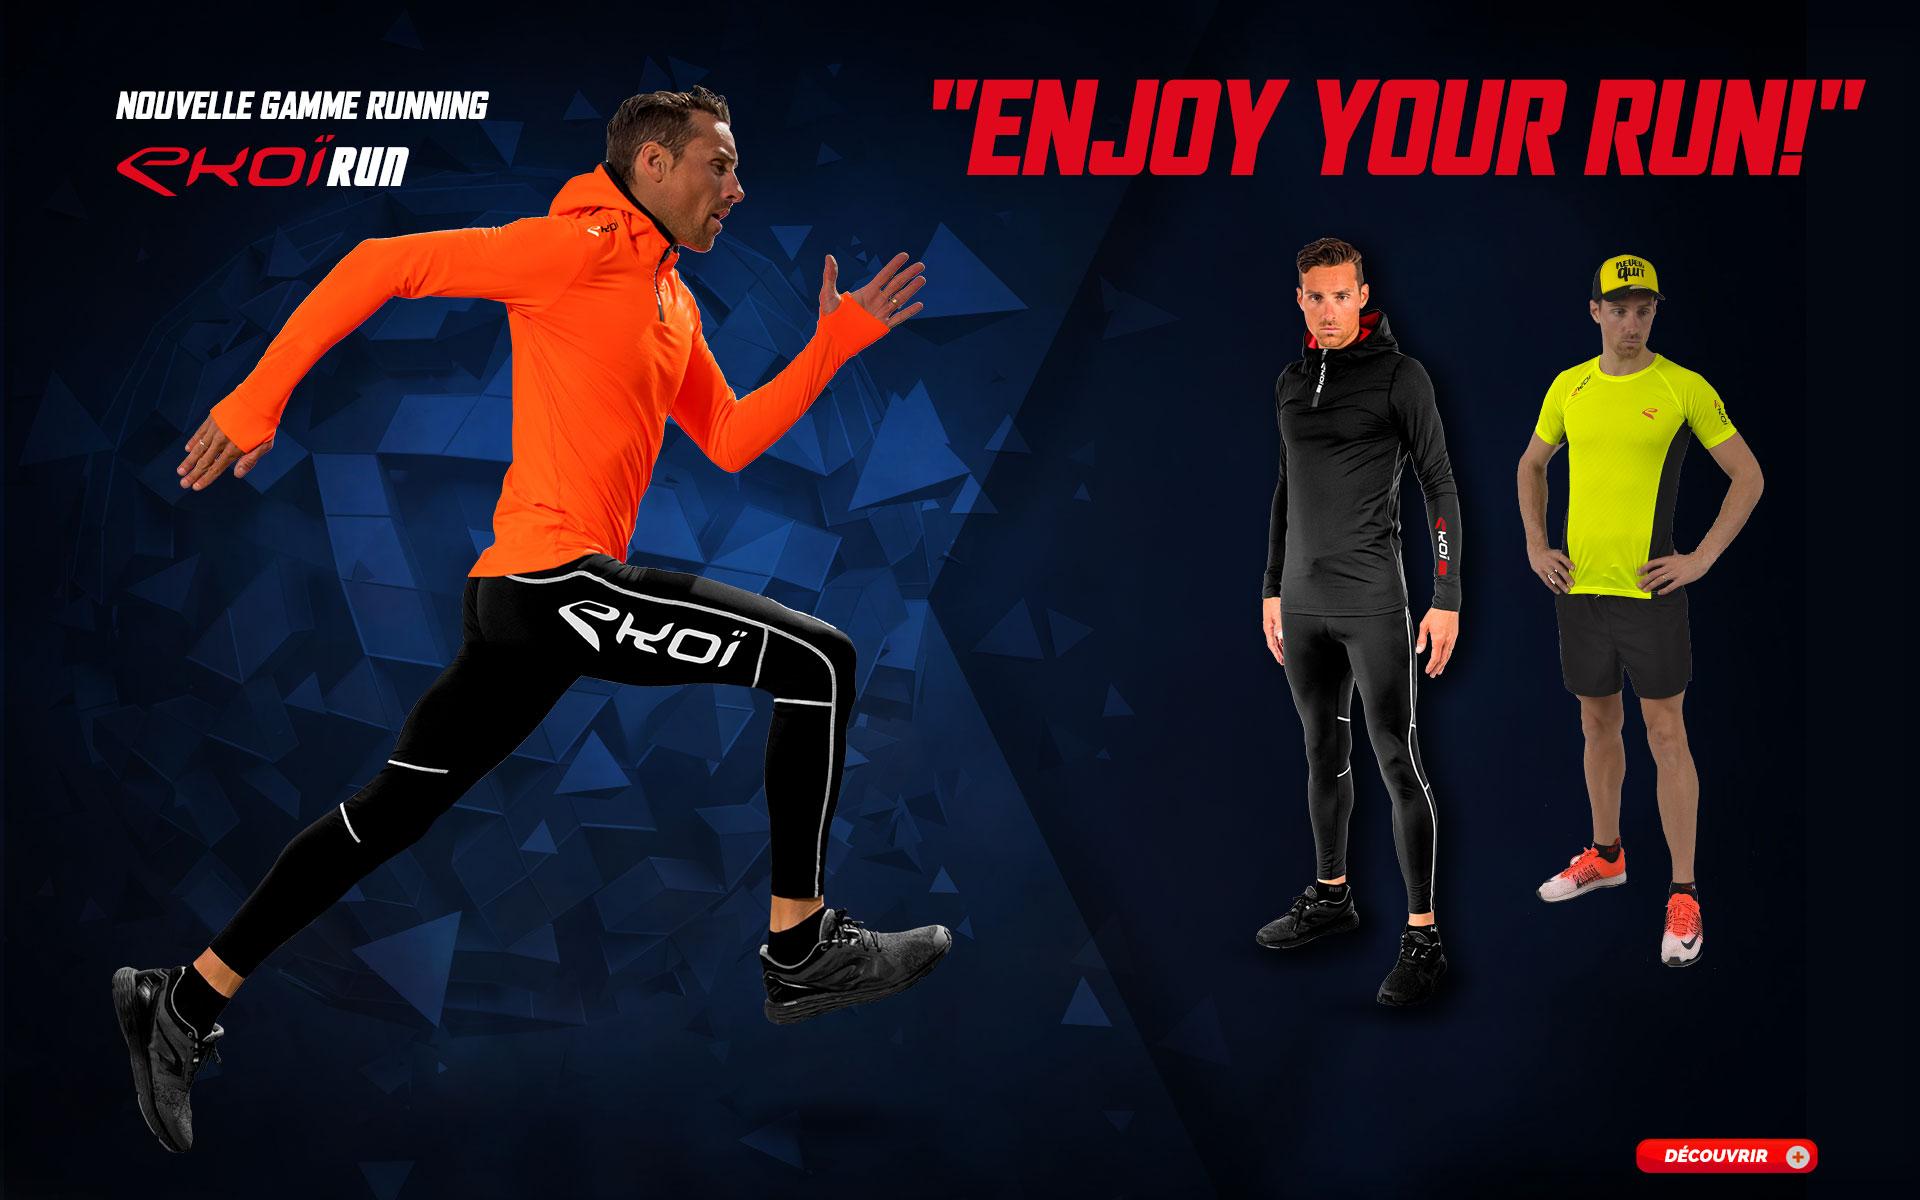 Nouvelle gamme Running EKOI 2018